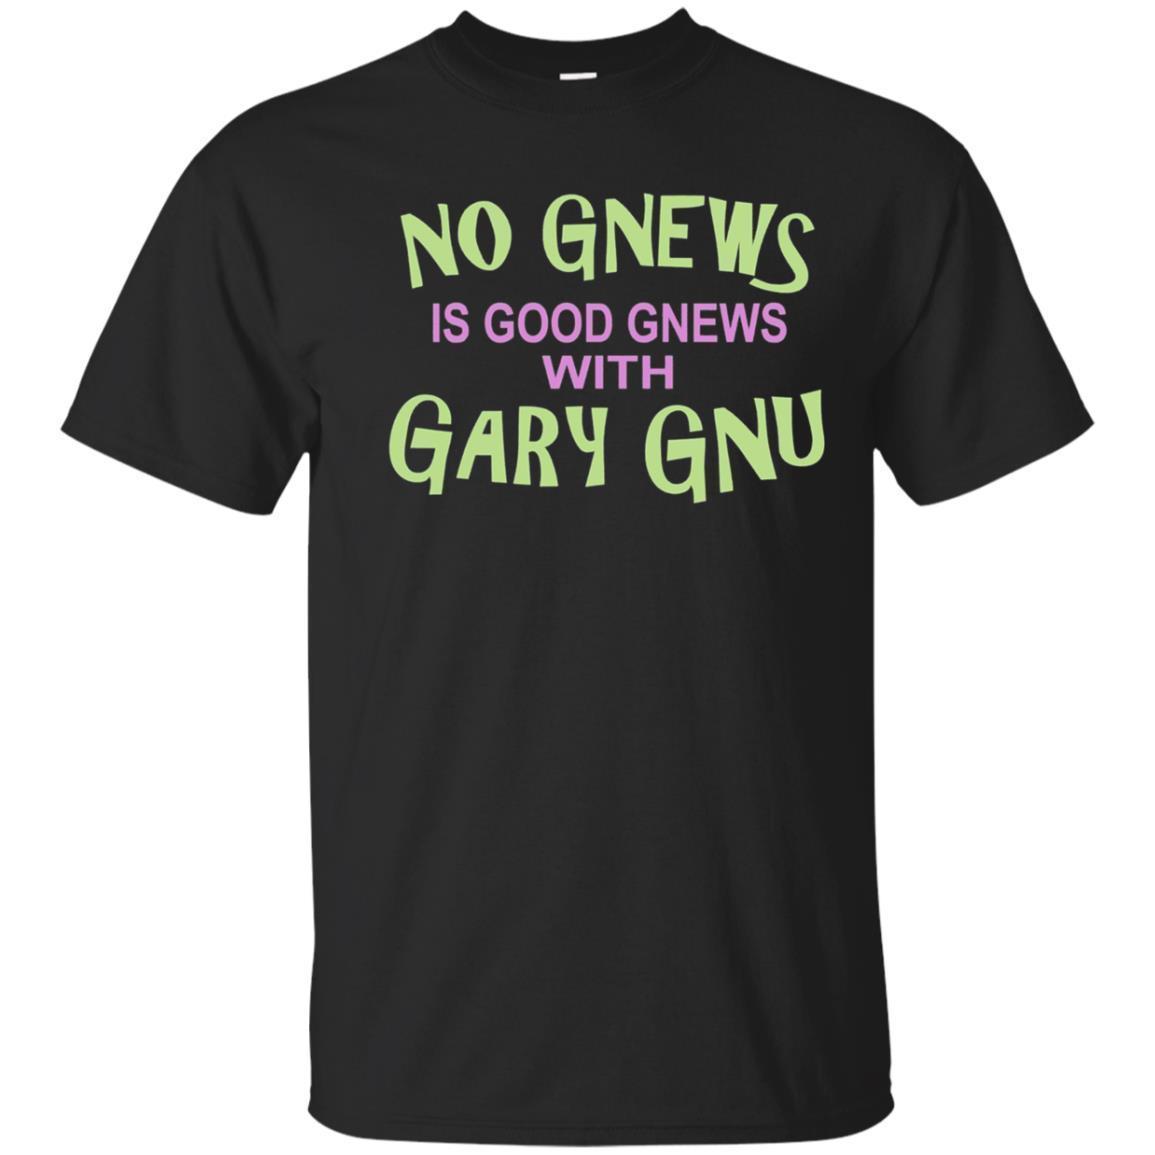 No Gnews Is Good Gnews With Gary Gnu Funny T Shirt